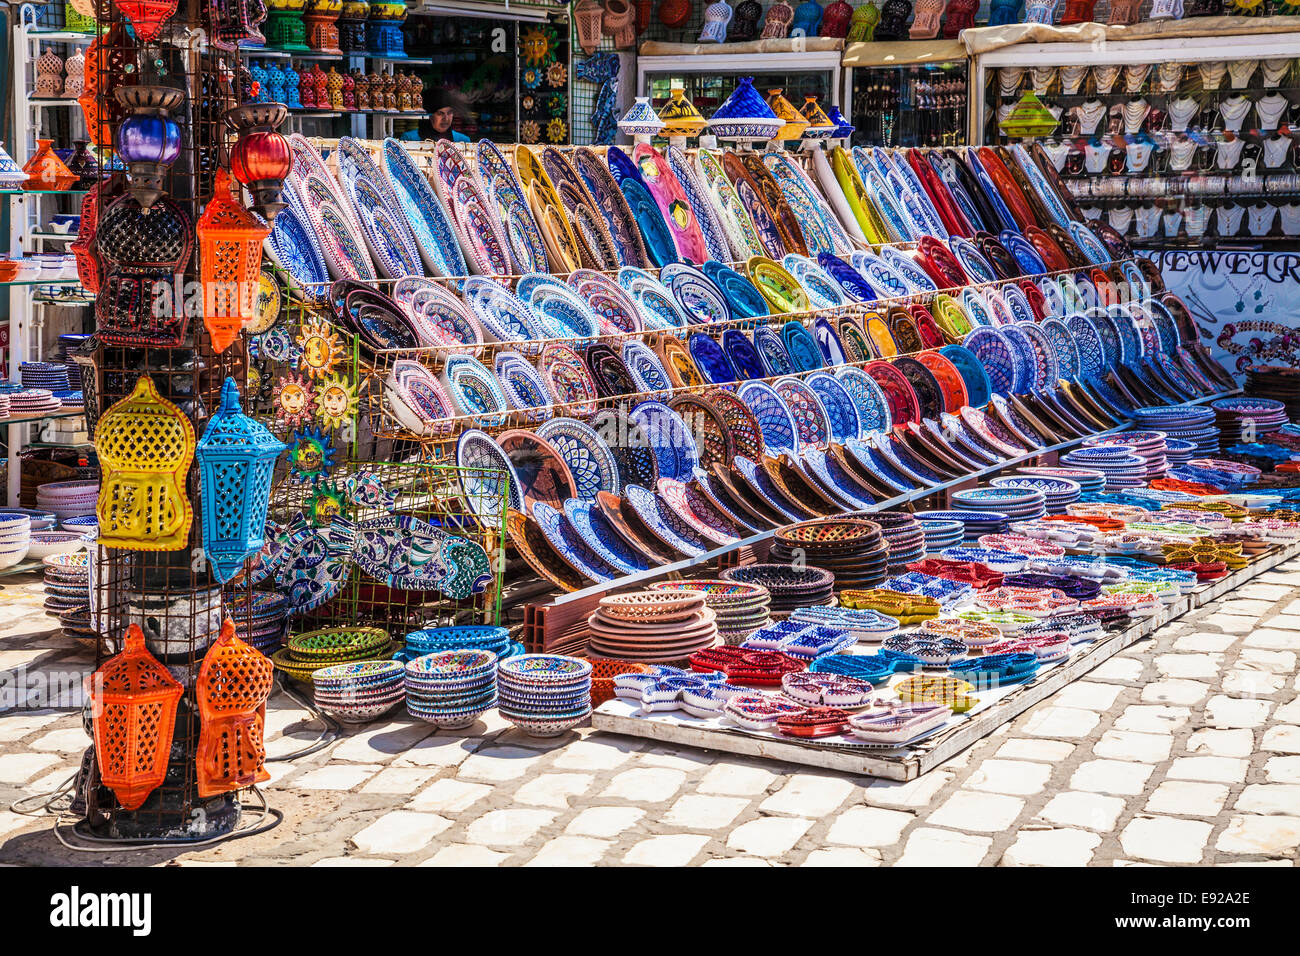 Arab Handicrafts Stock Photos Amp Arab Handicrafts Stock